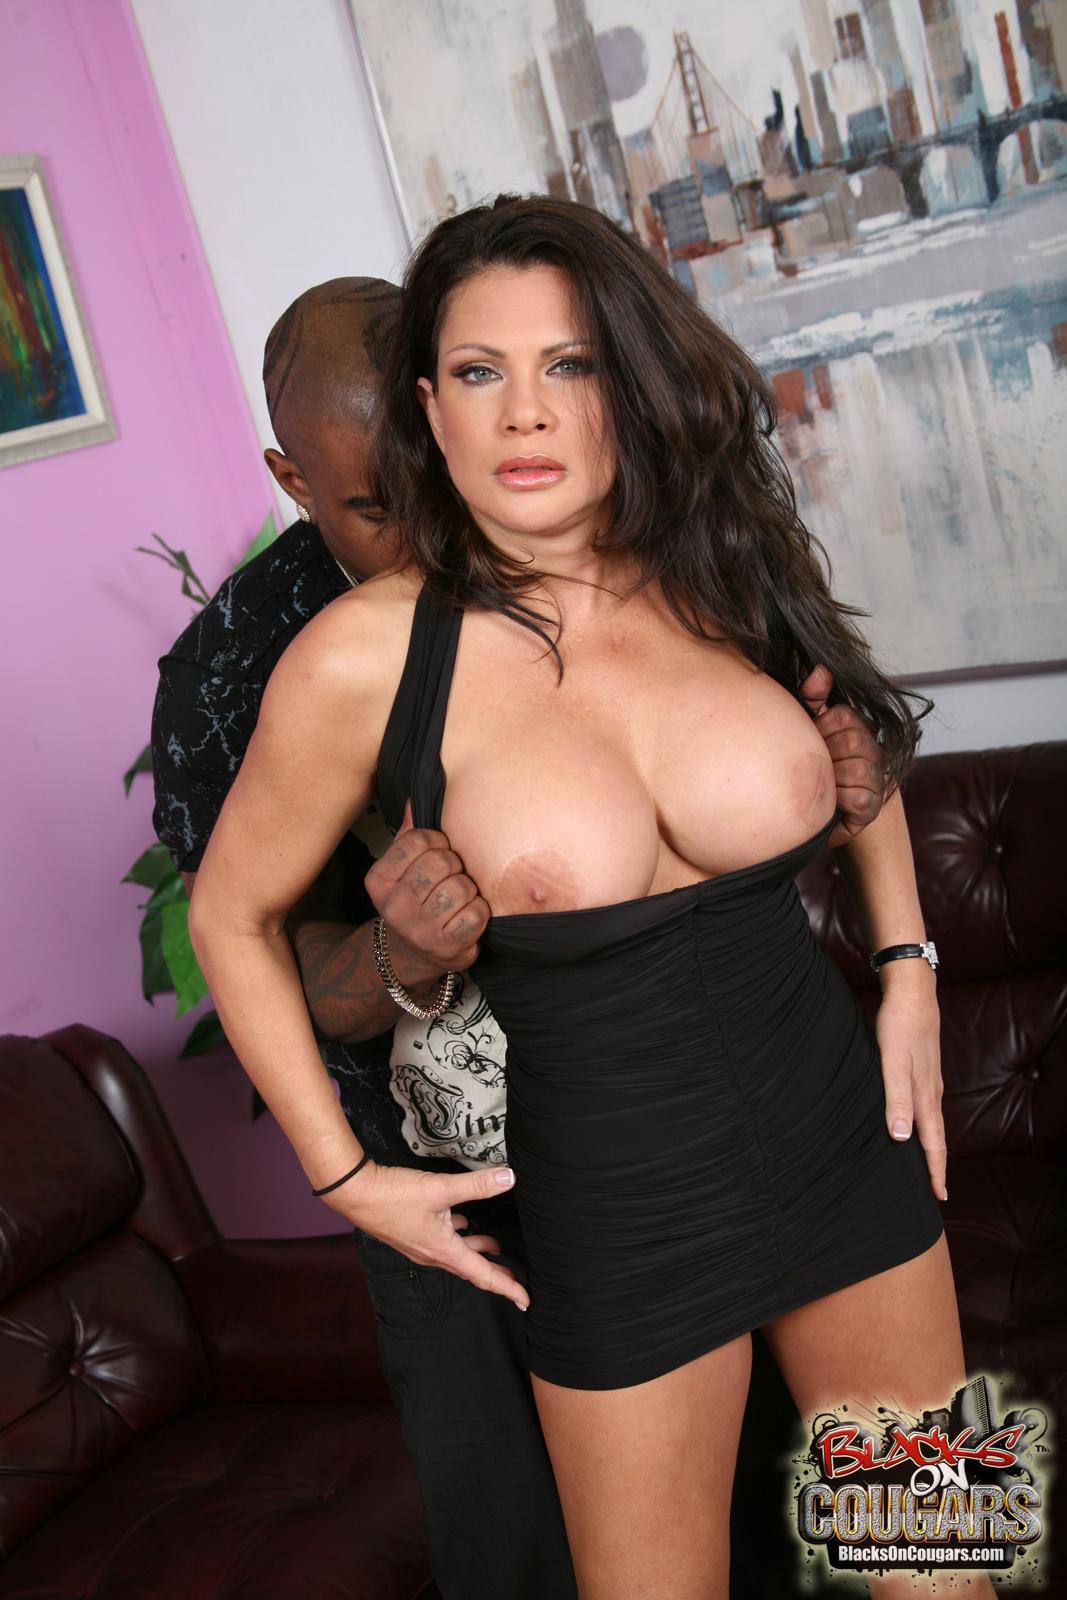 charming long haired brunette milf in sexy black dress enjoys meaty